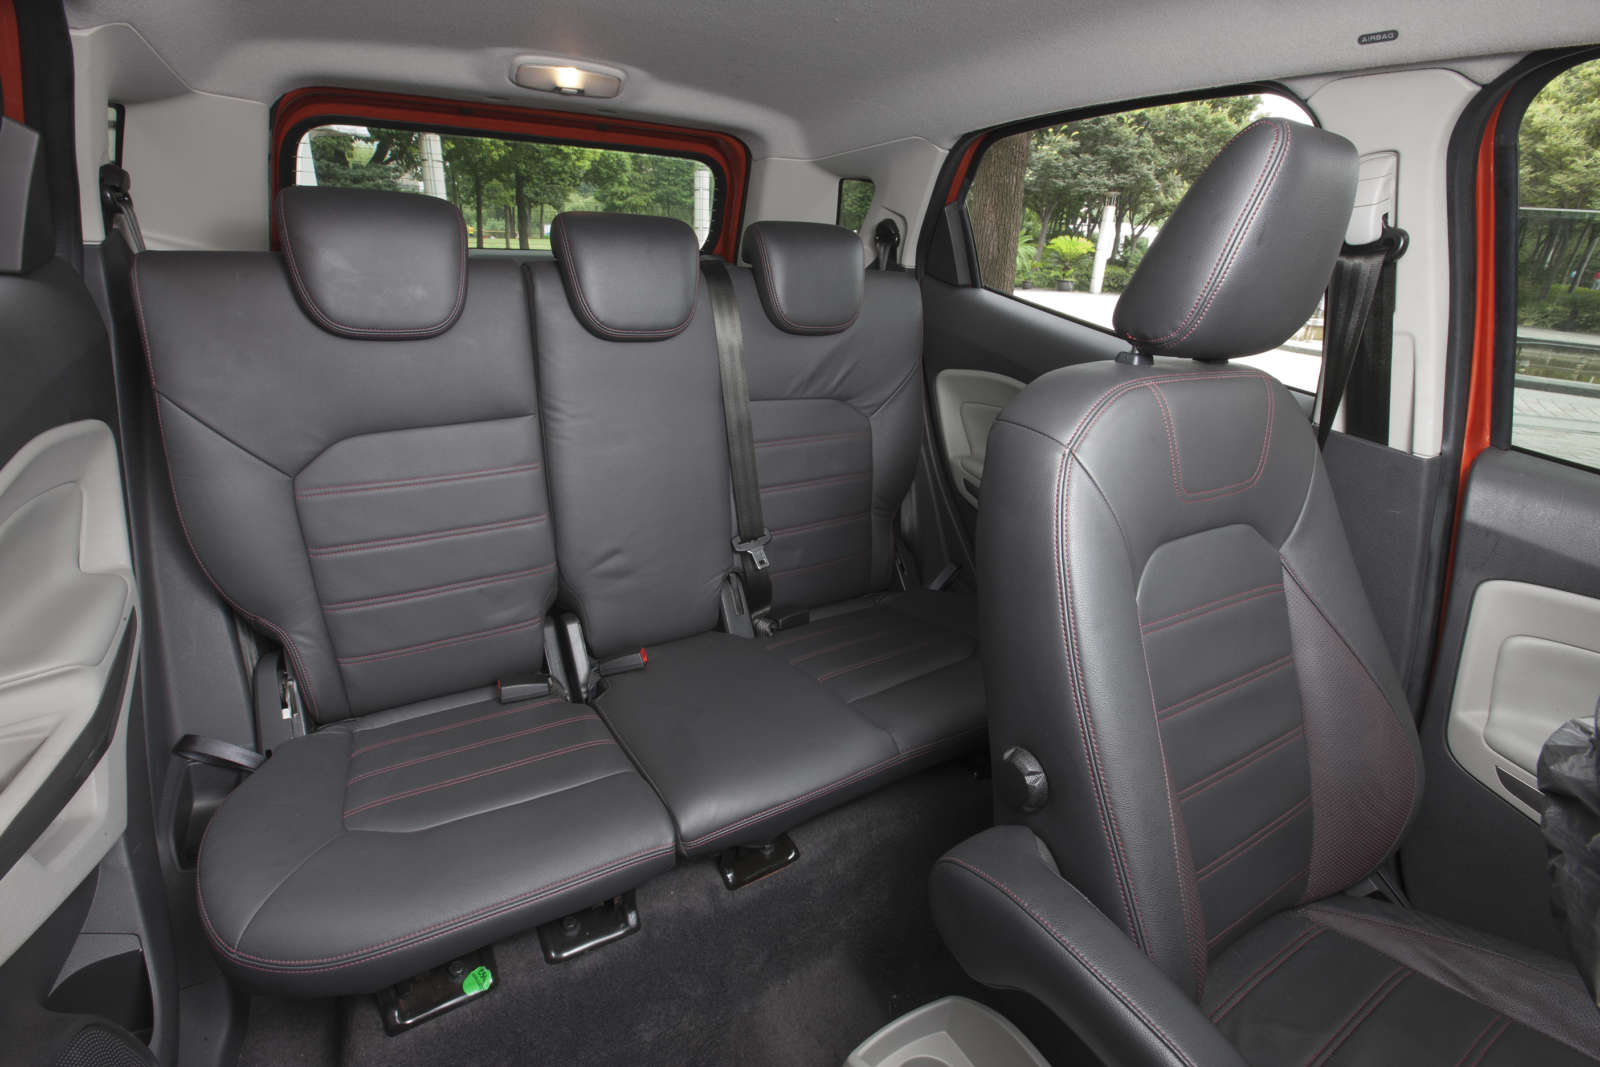 Ford EcoSport Car Interior